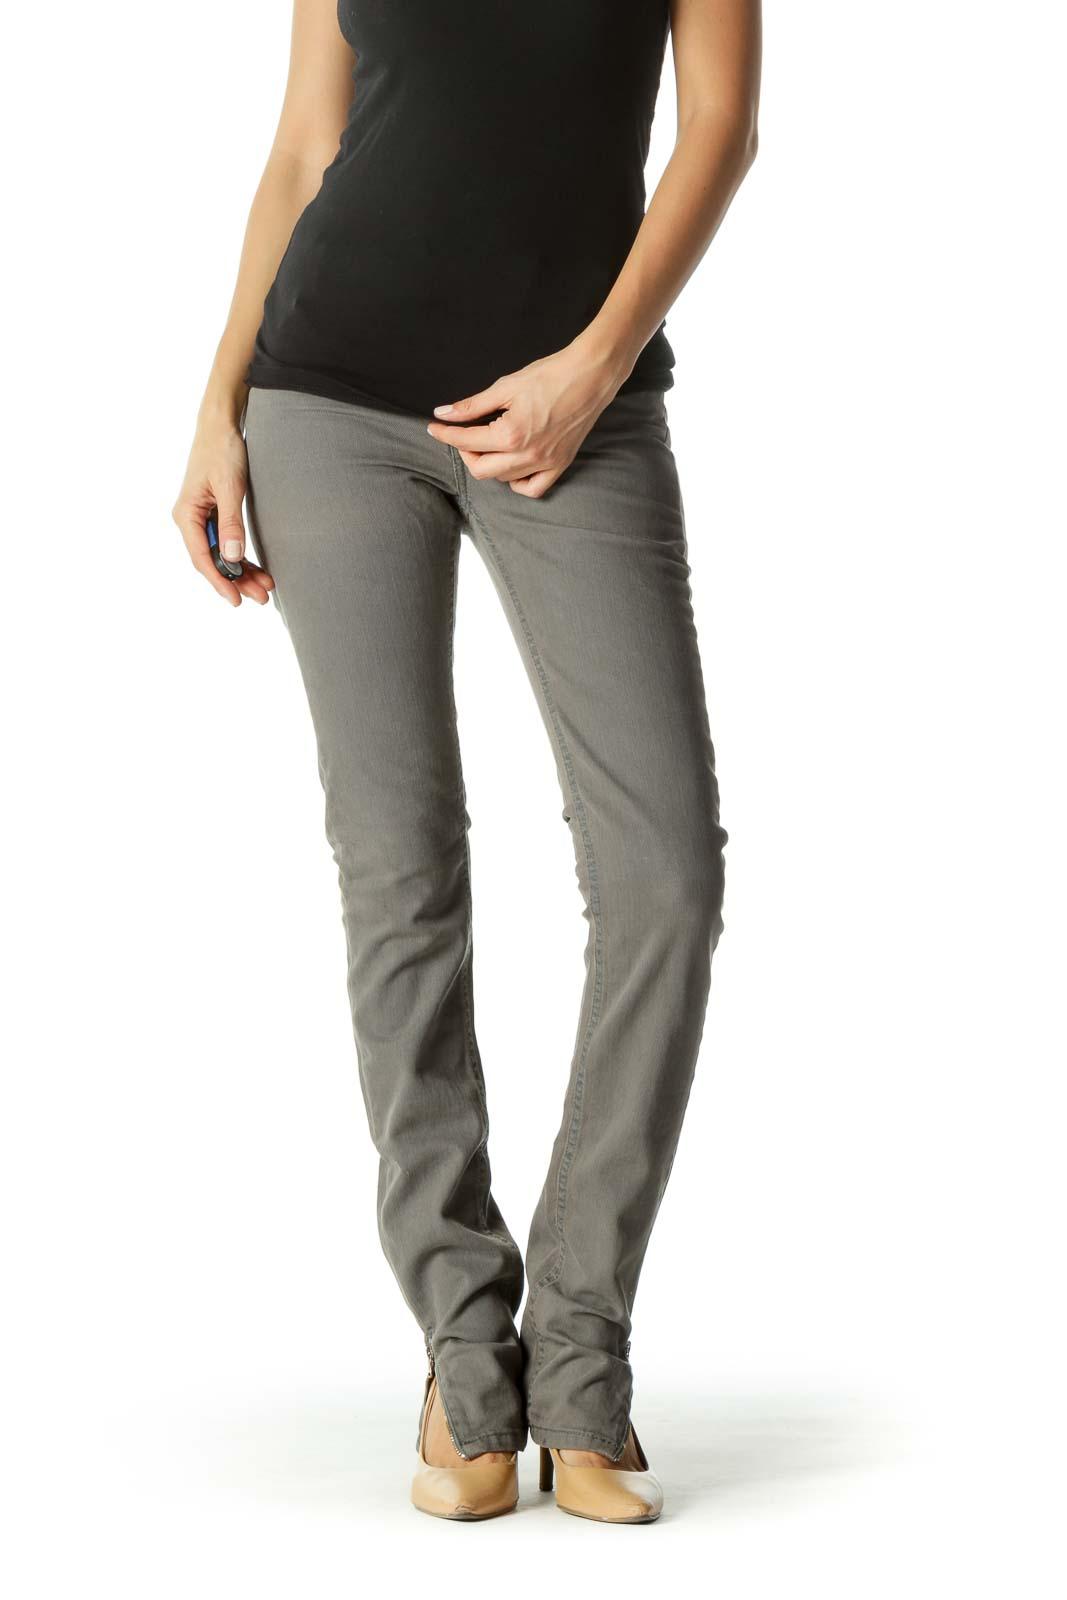 Gray Ankle Zippers Back Pocket Applique Slim Denim Pants Front